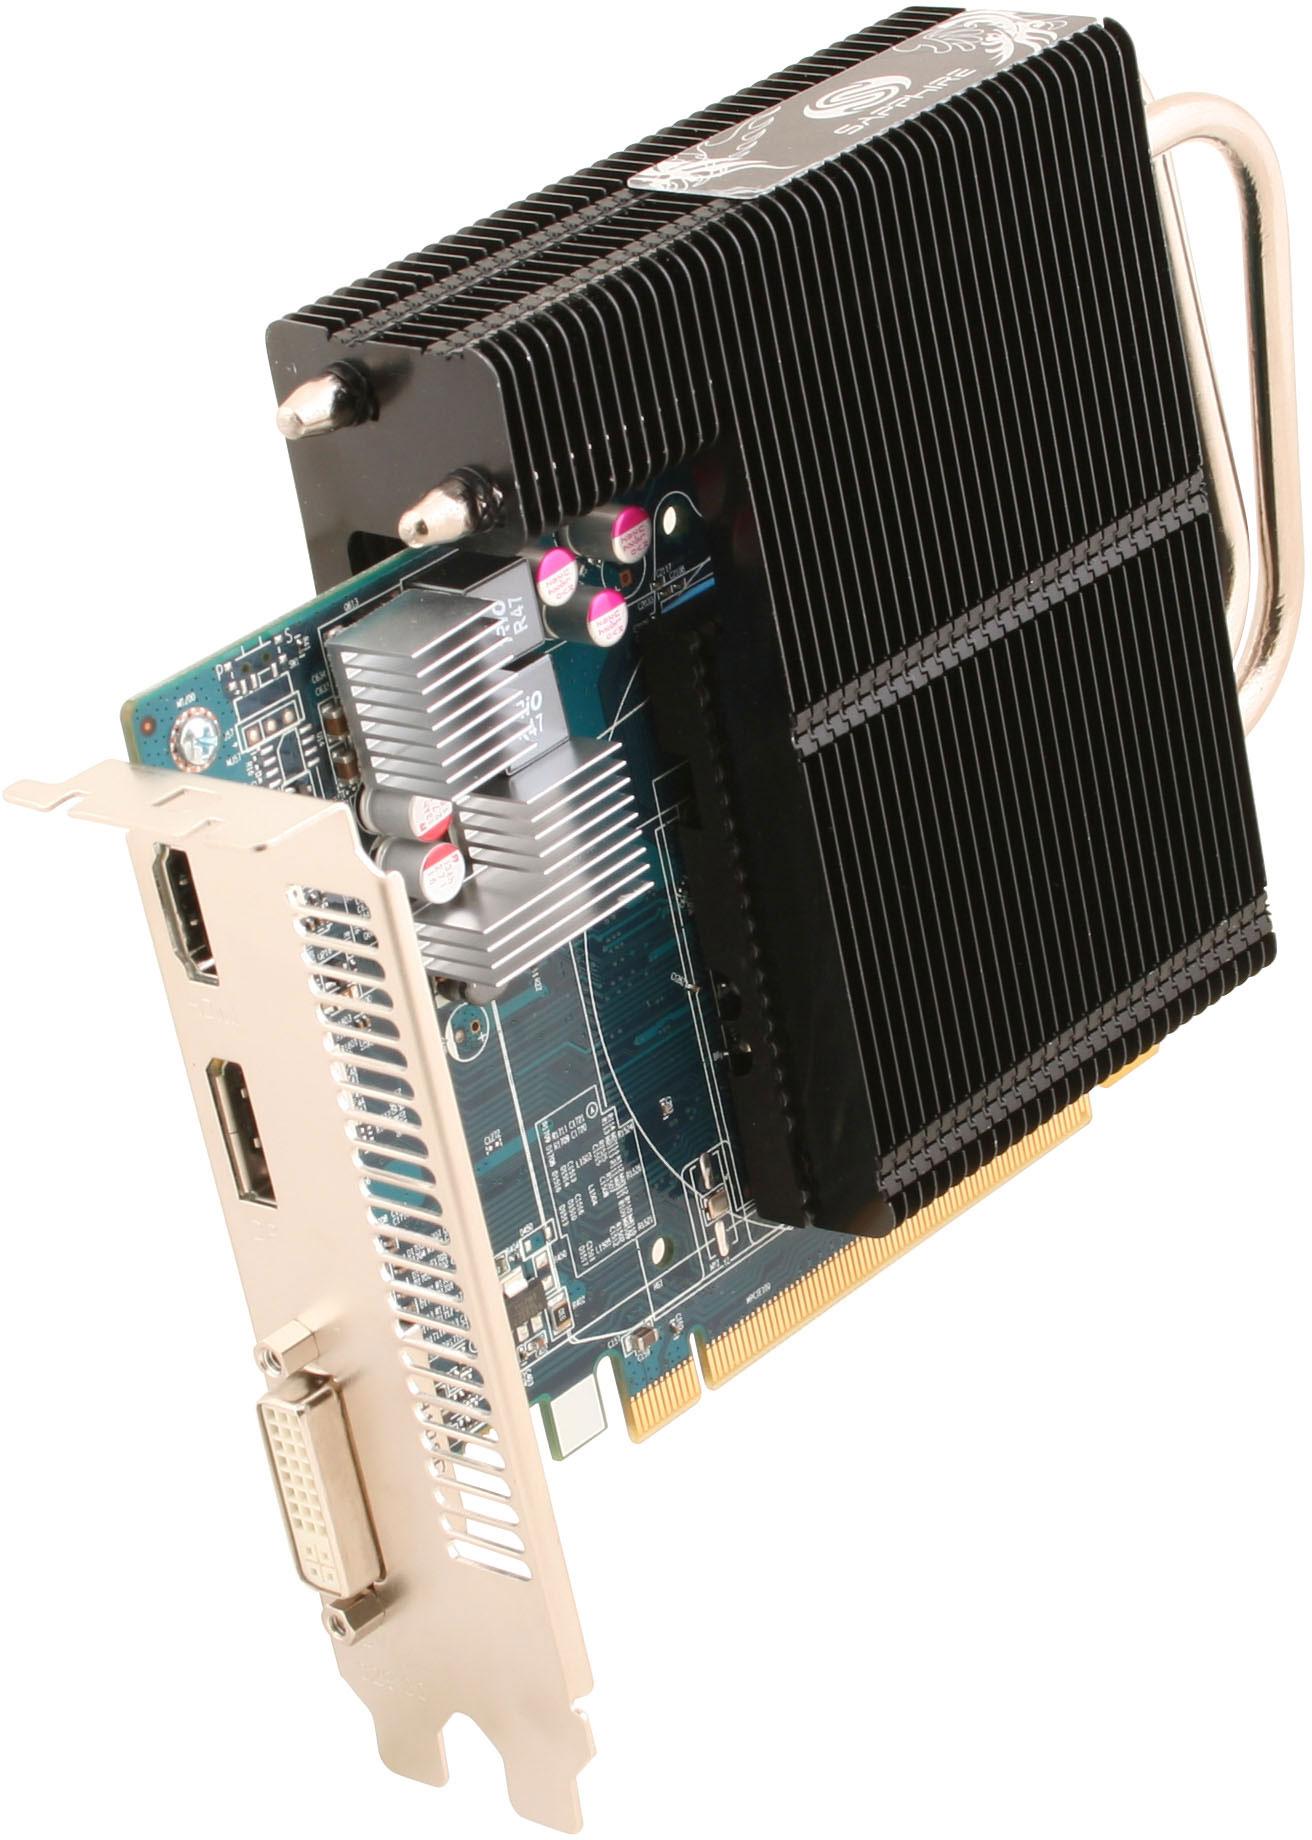 SAPPHIRE 6670 1GB DDR5 DRIVER FOR WINDOWS